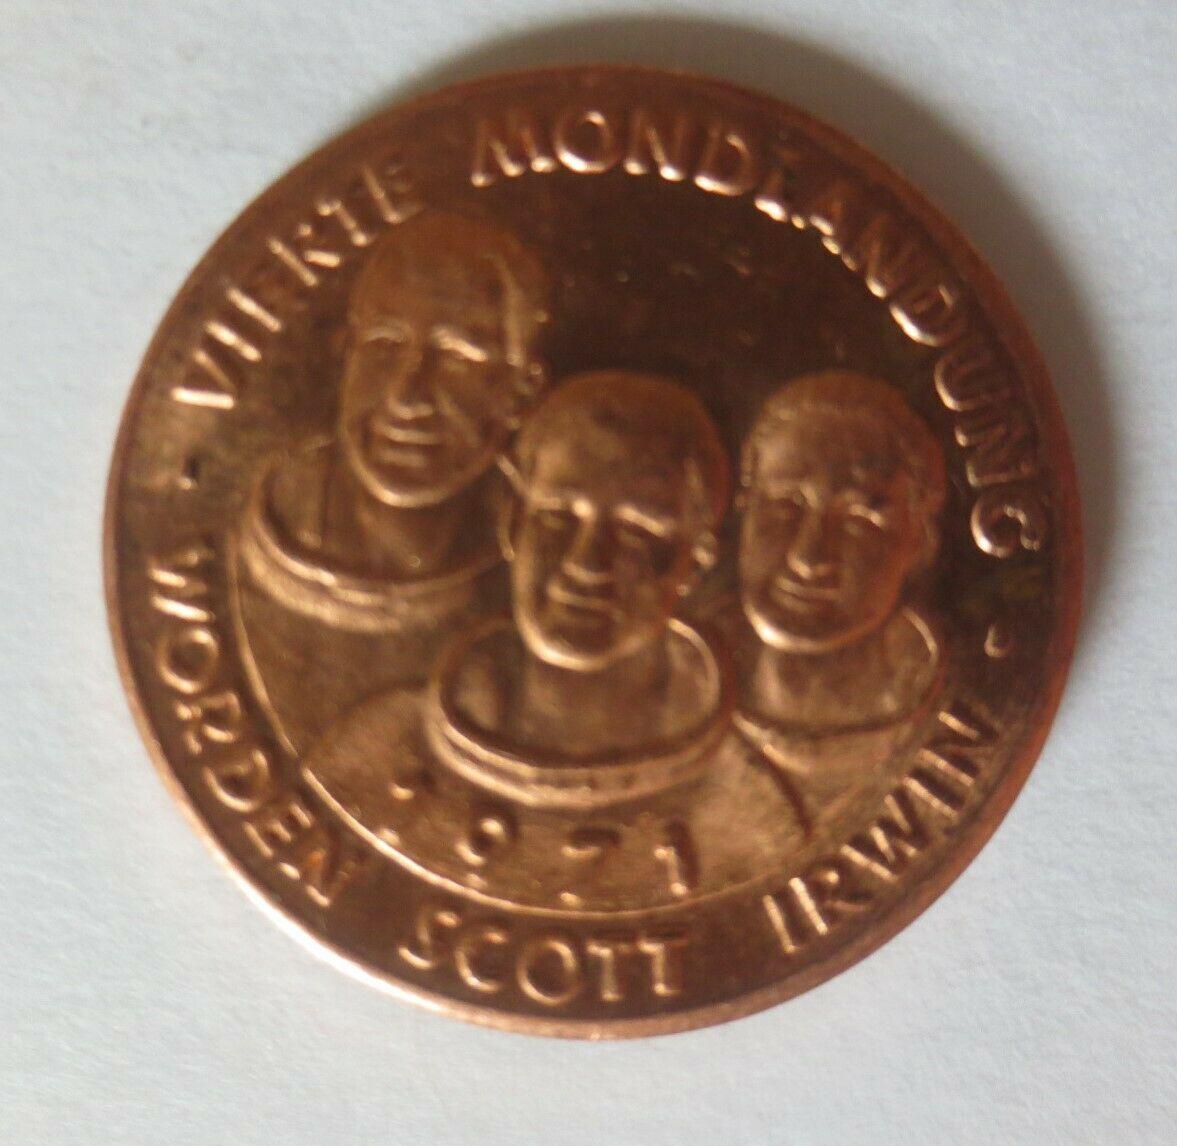 Medaille 1971 Deutschland Apollo 15 - Raumfahrt - Scott - Worden - Irwin♥(46373) 0